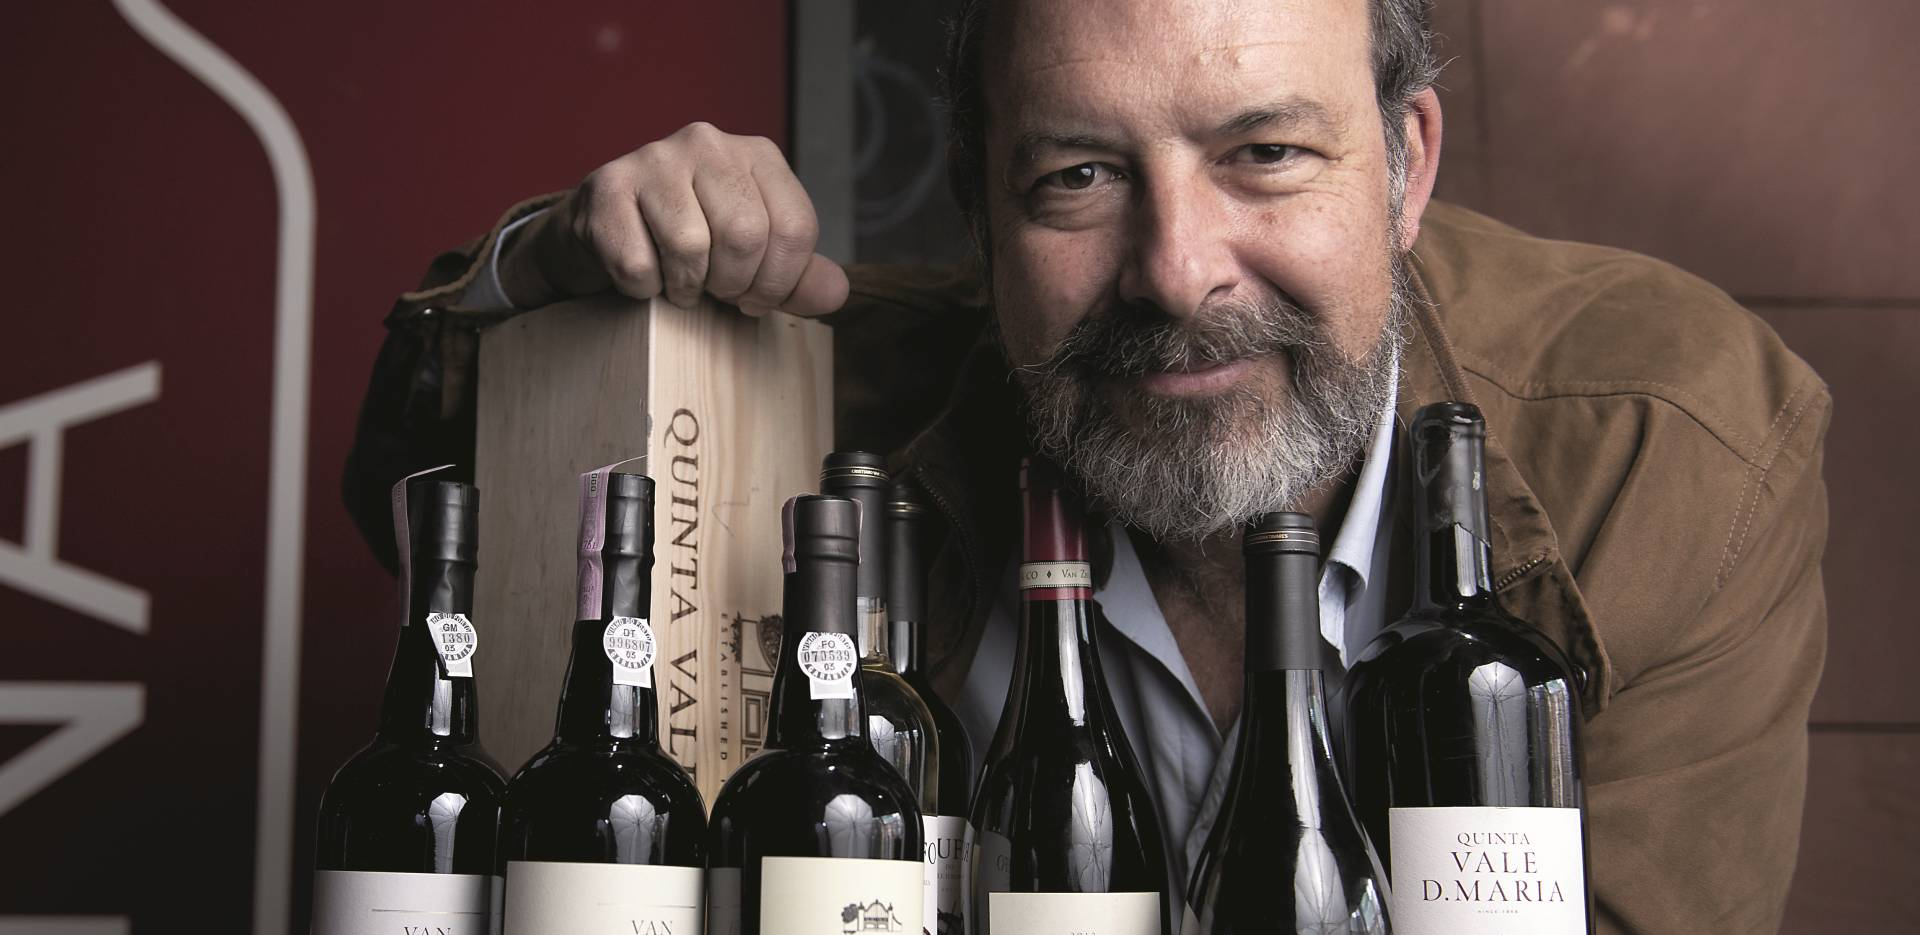 Razgrabljena vina Portugalca Cristiana van Zellera u Hrvatskoj